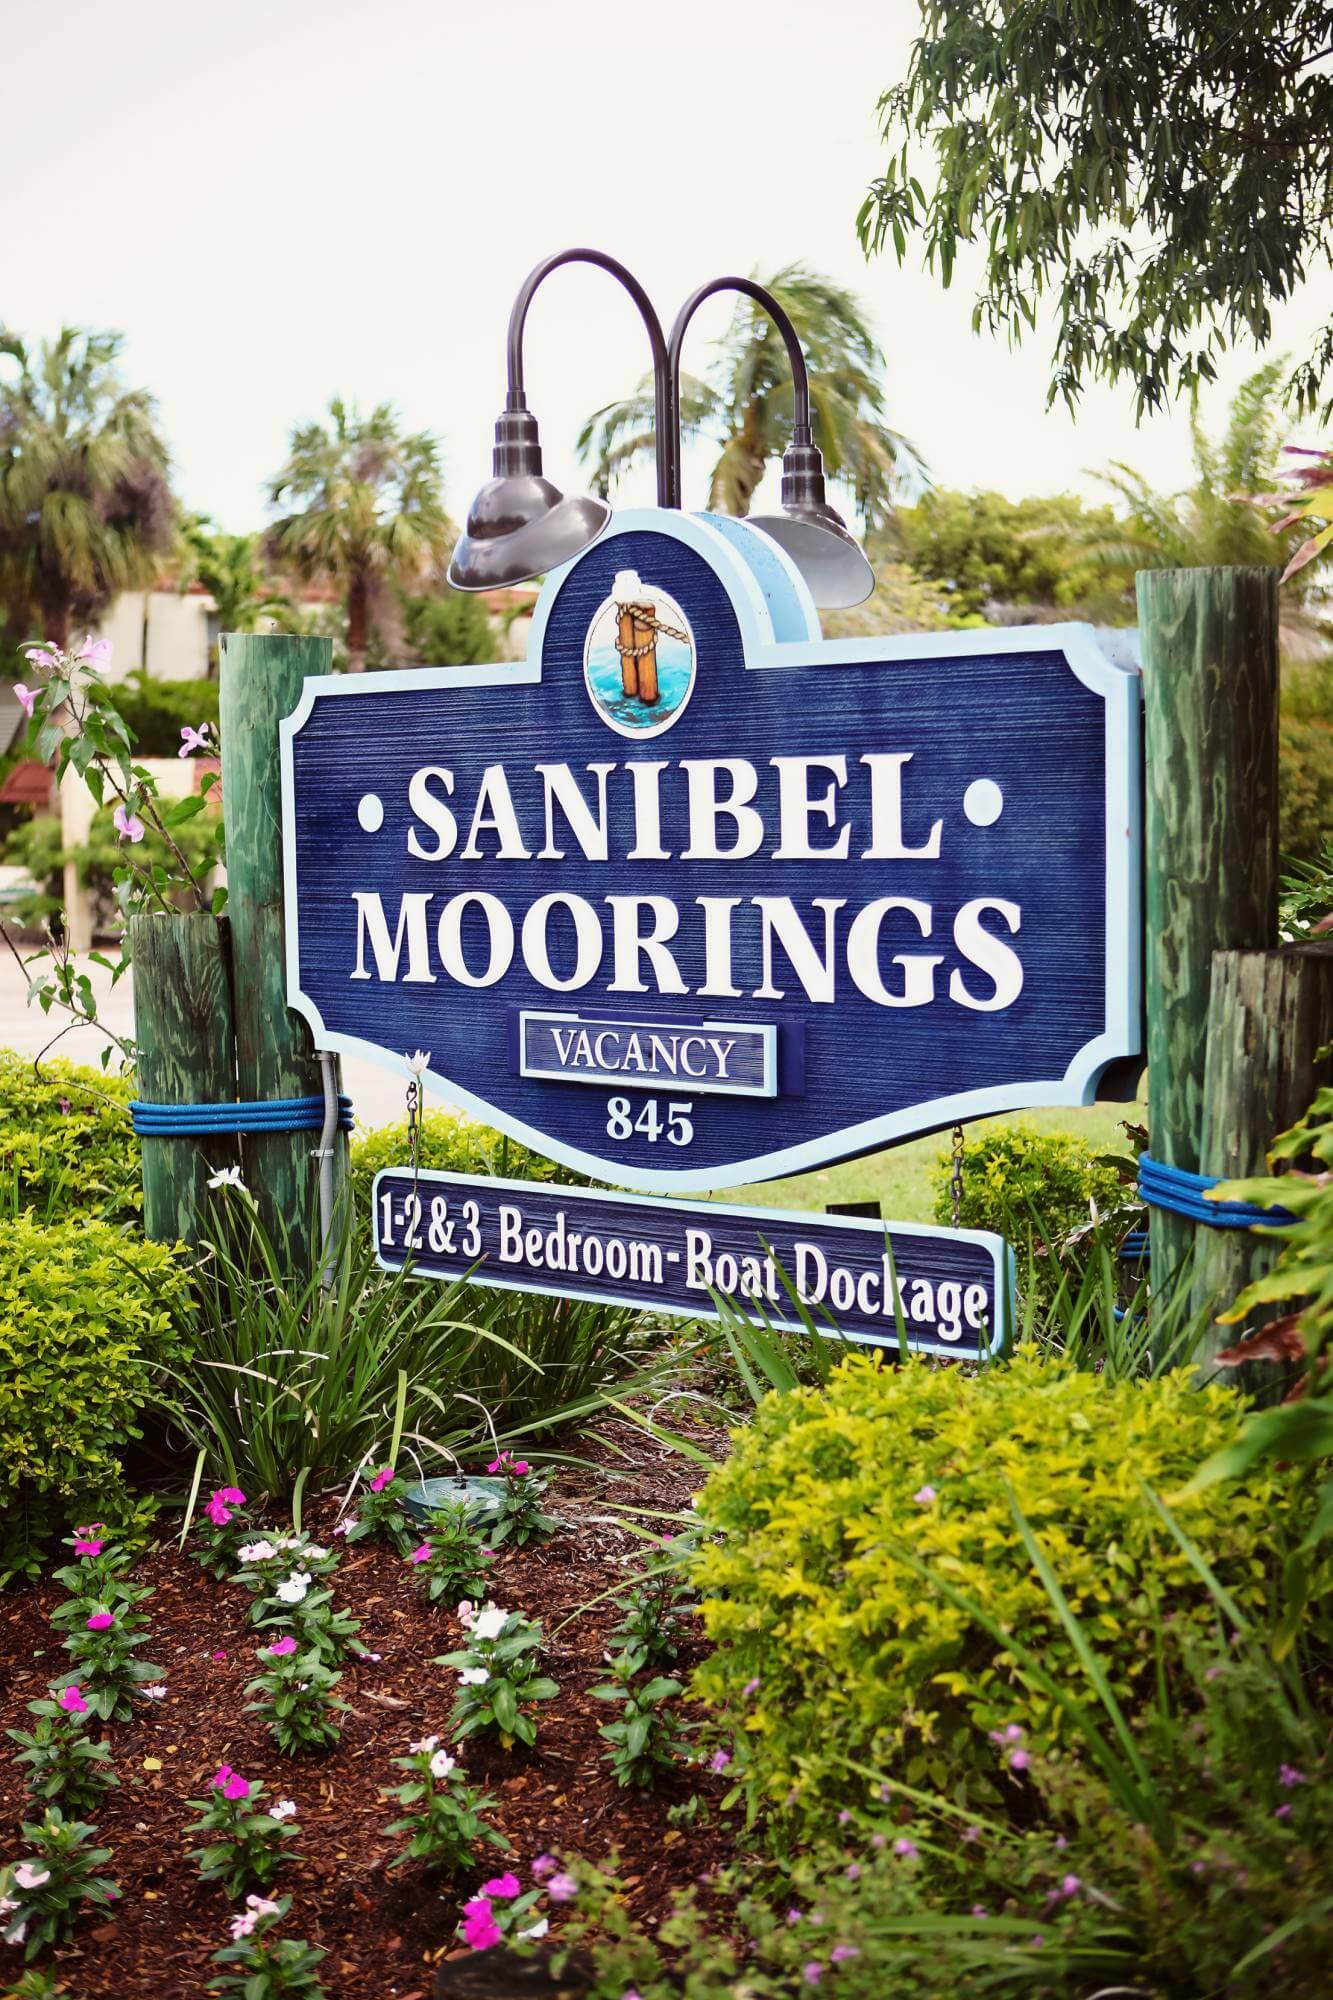 Sanibel Moorings beachfront resort and vacation rentals on Sanibel Island, Florida.